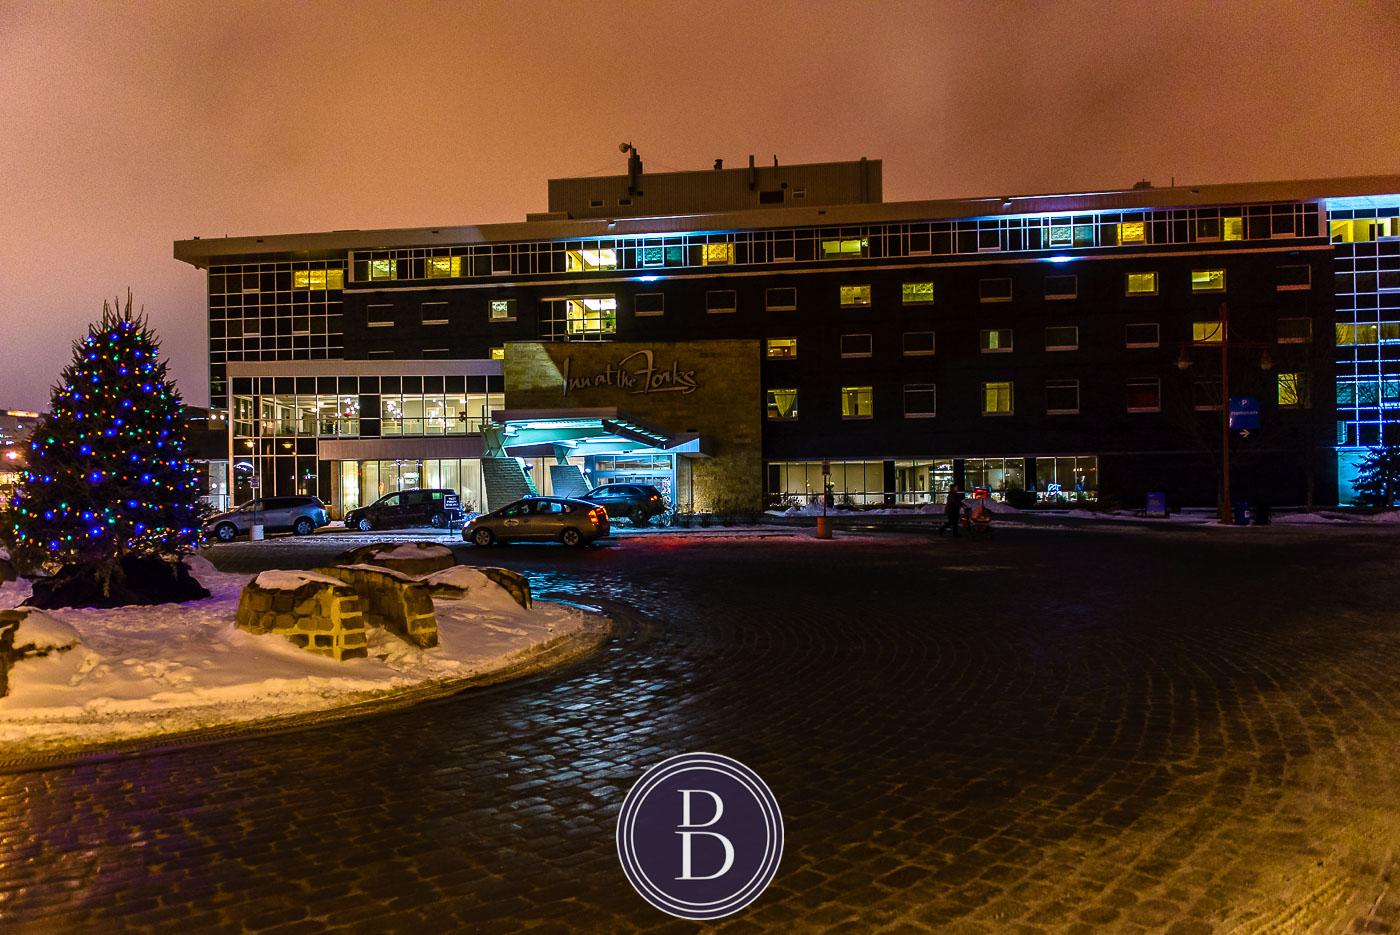 Inn at the Forks Hotel at night